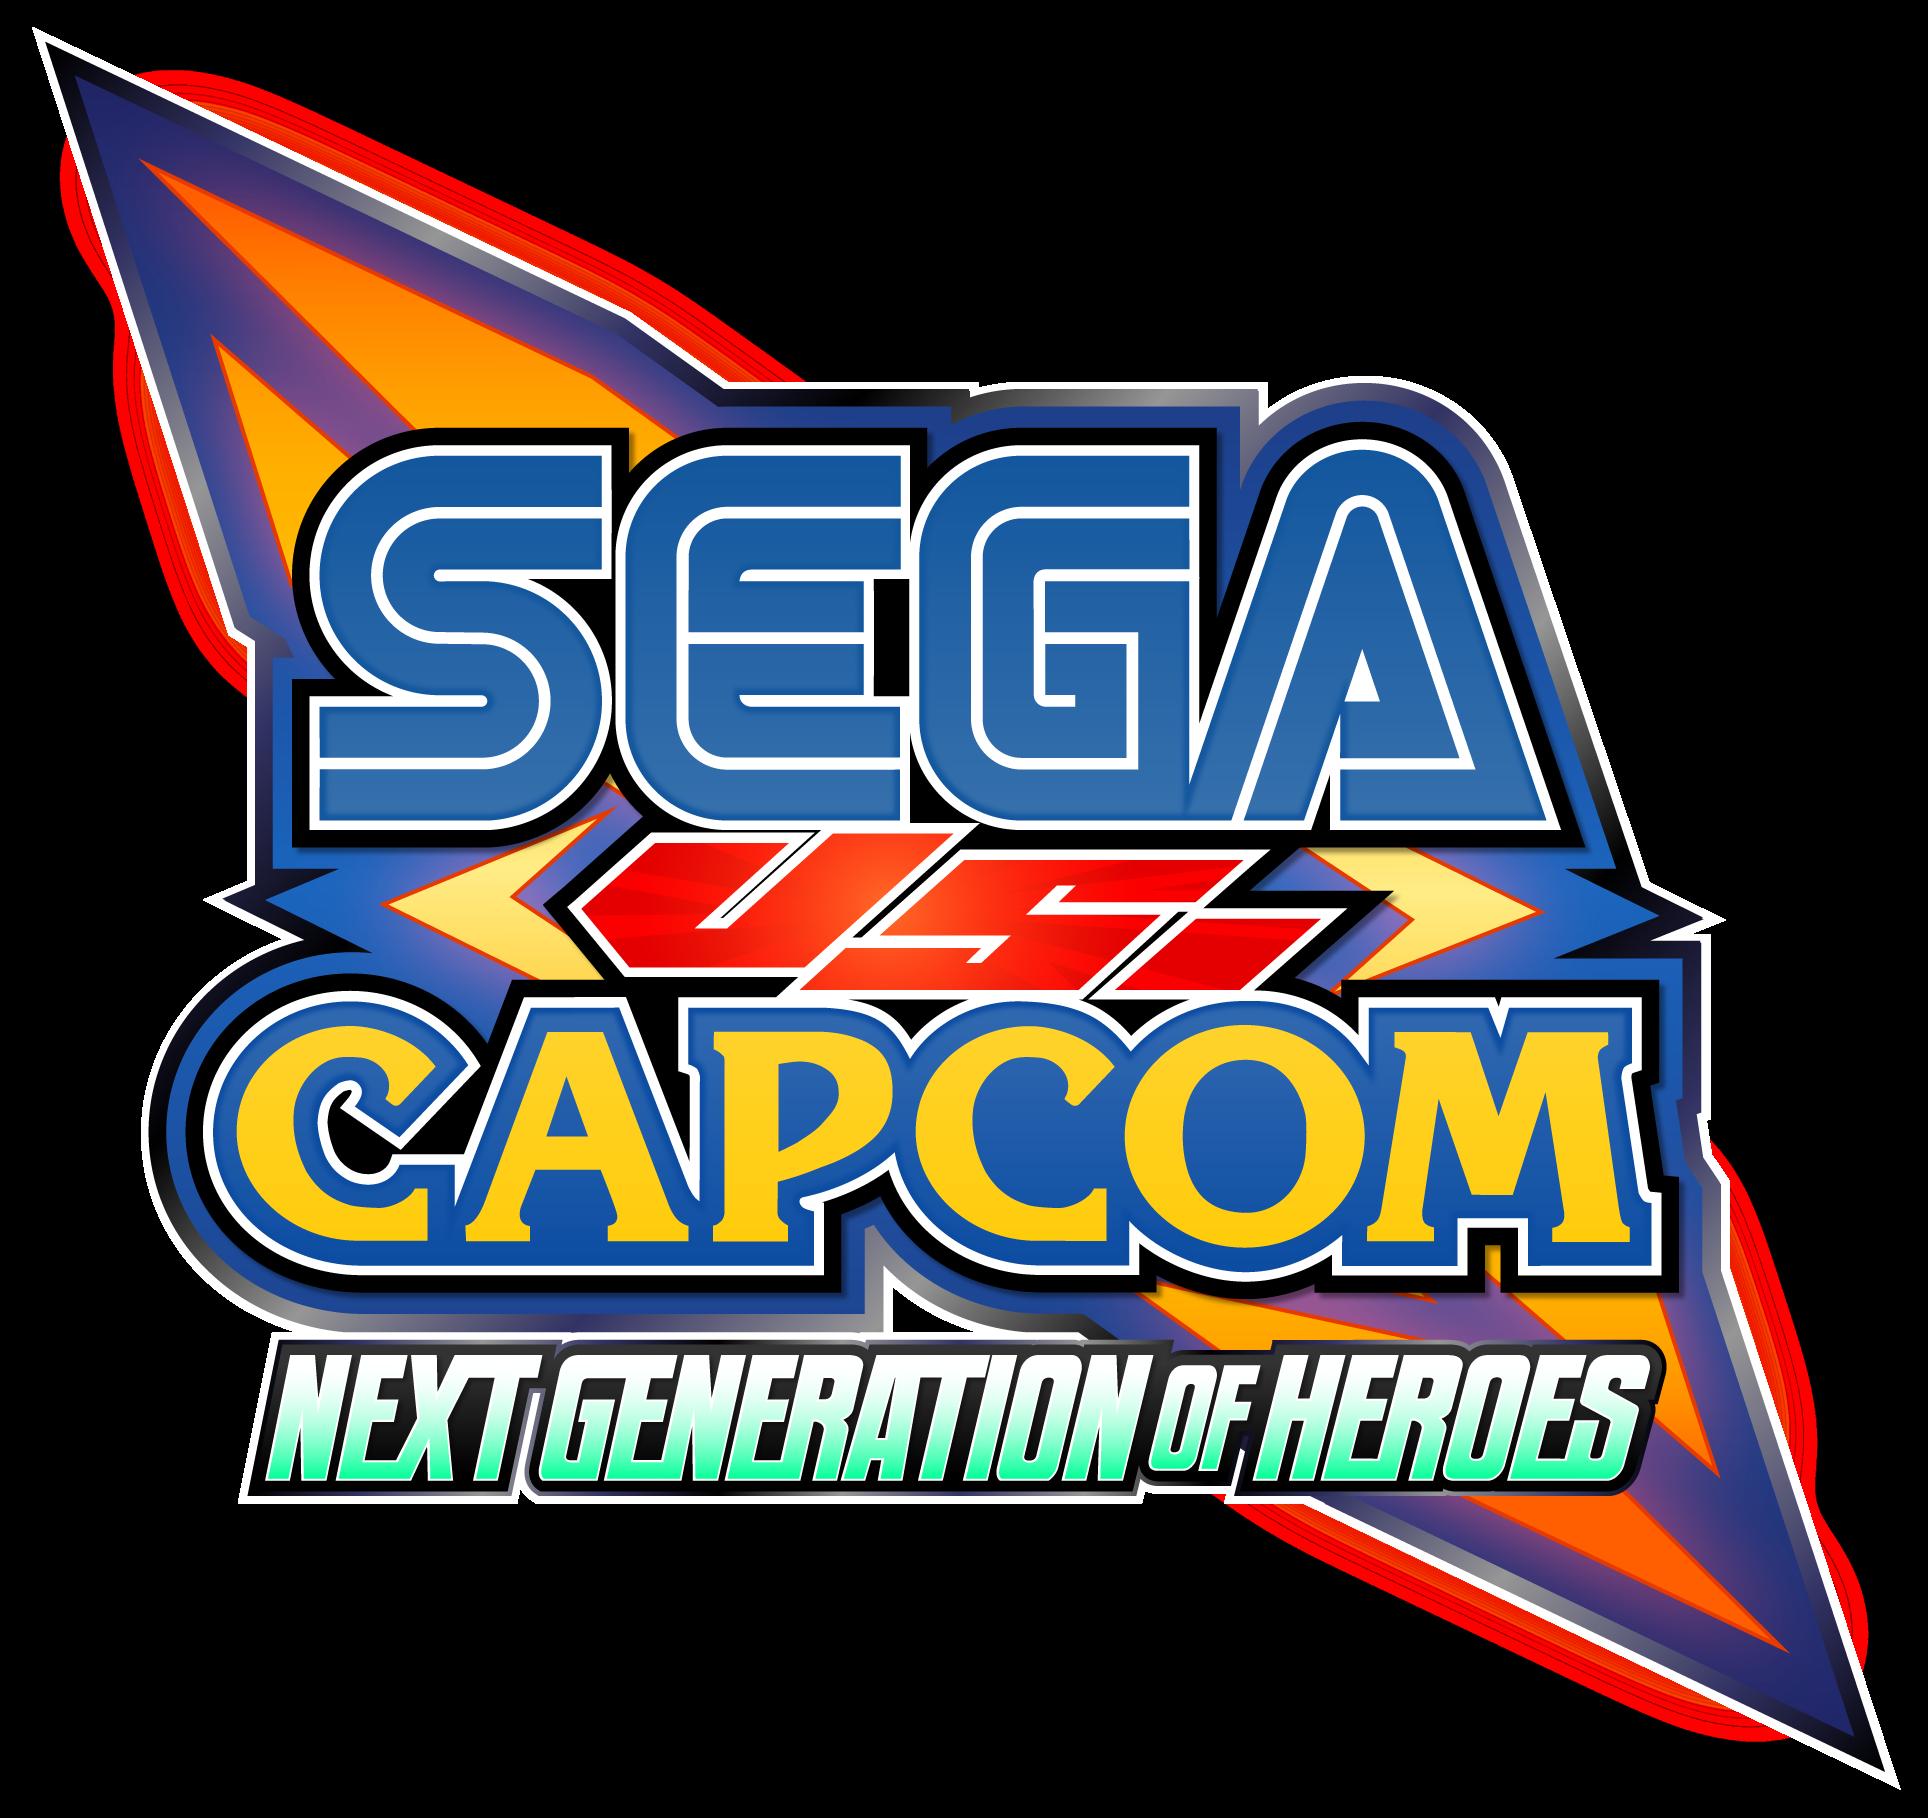 Pin By Alexander Dragonball On Game Brand Capcom Vs Capcom Graphic Artwork